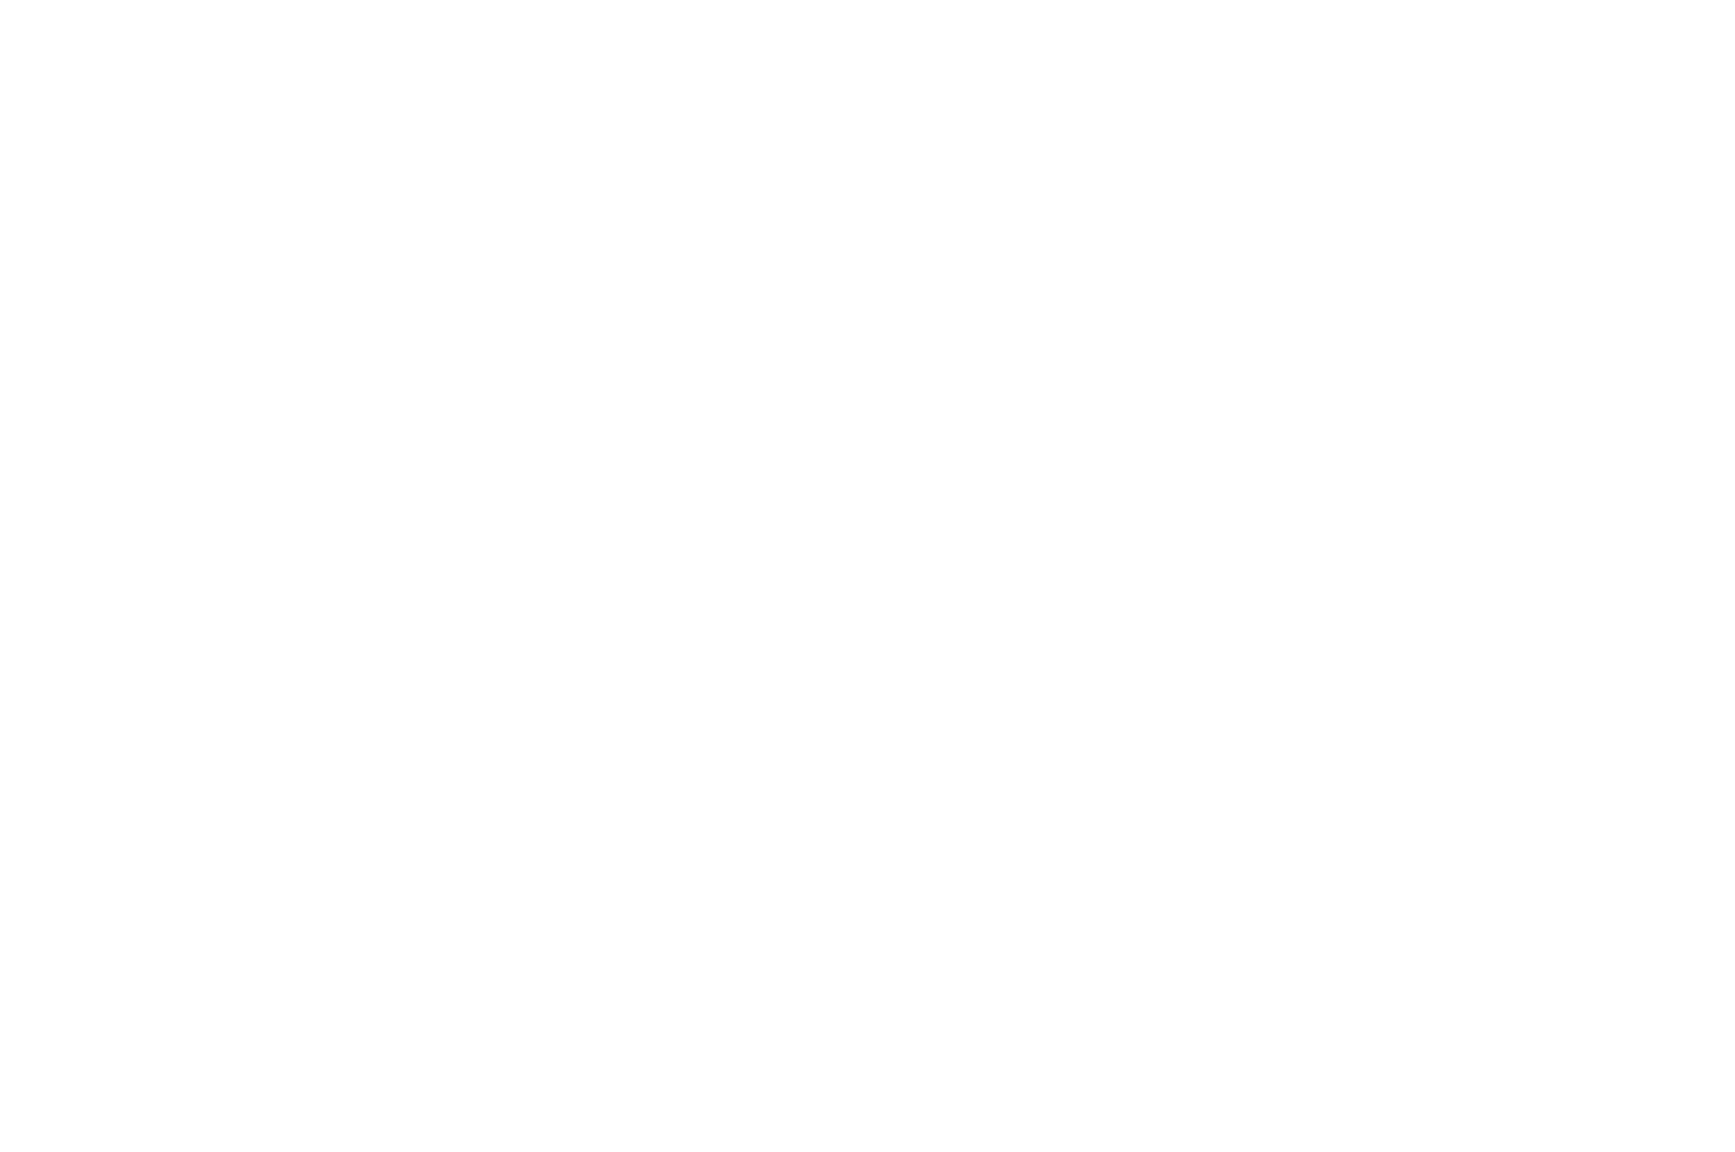 Black Muslim Girl Fly Film Festival - 2018.png